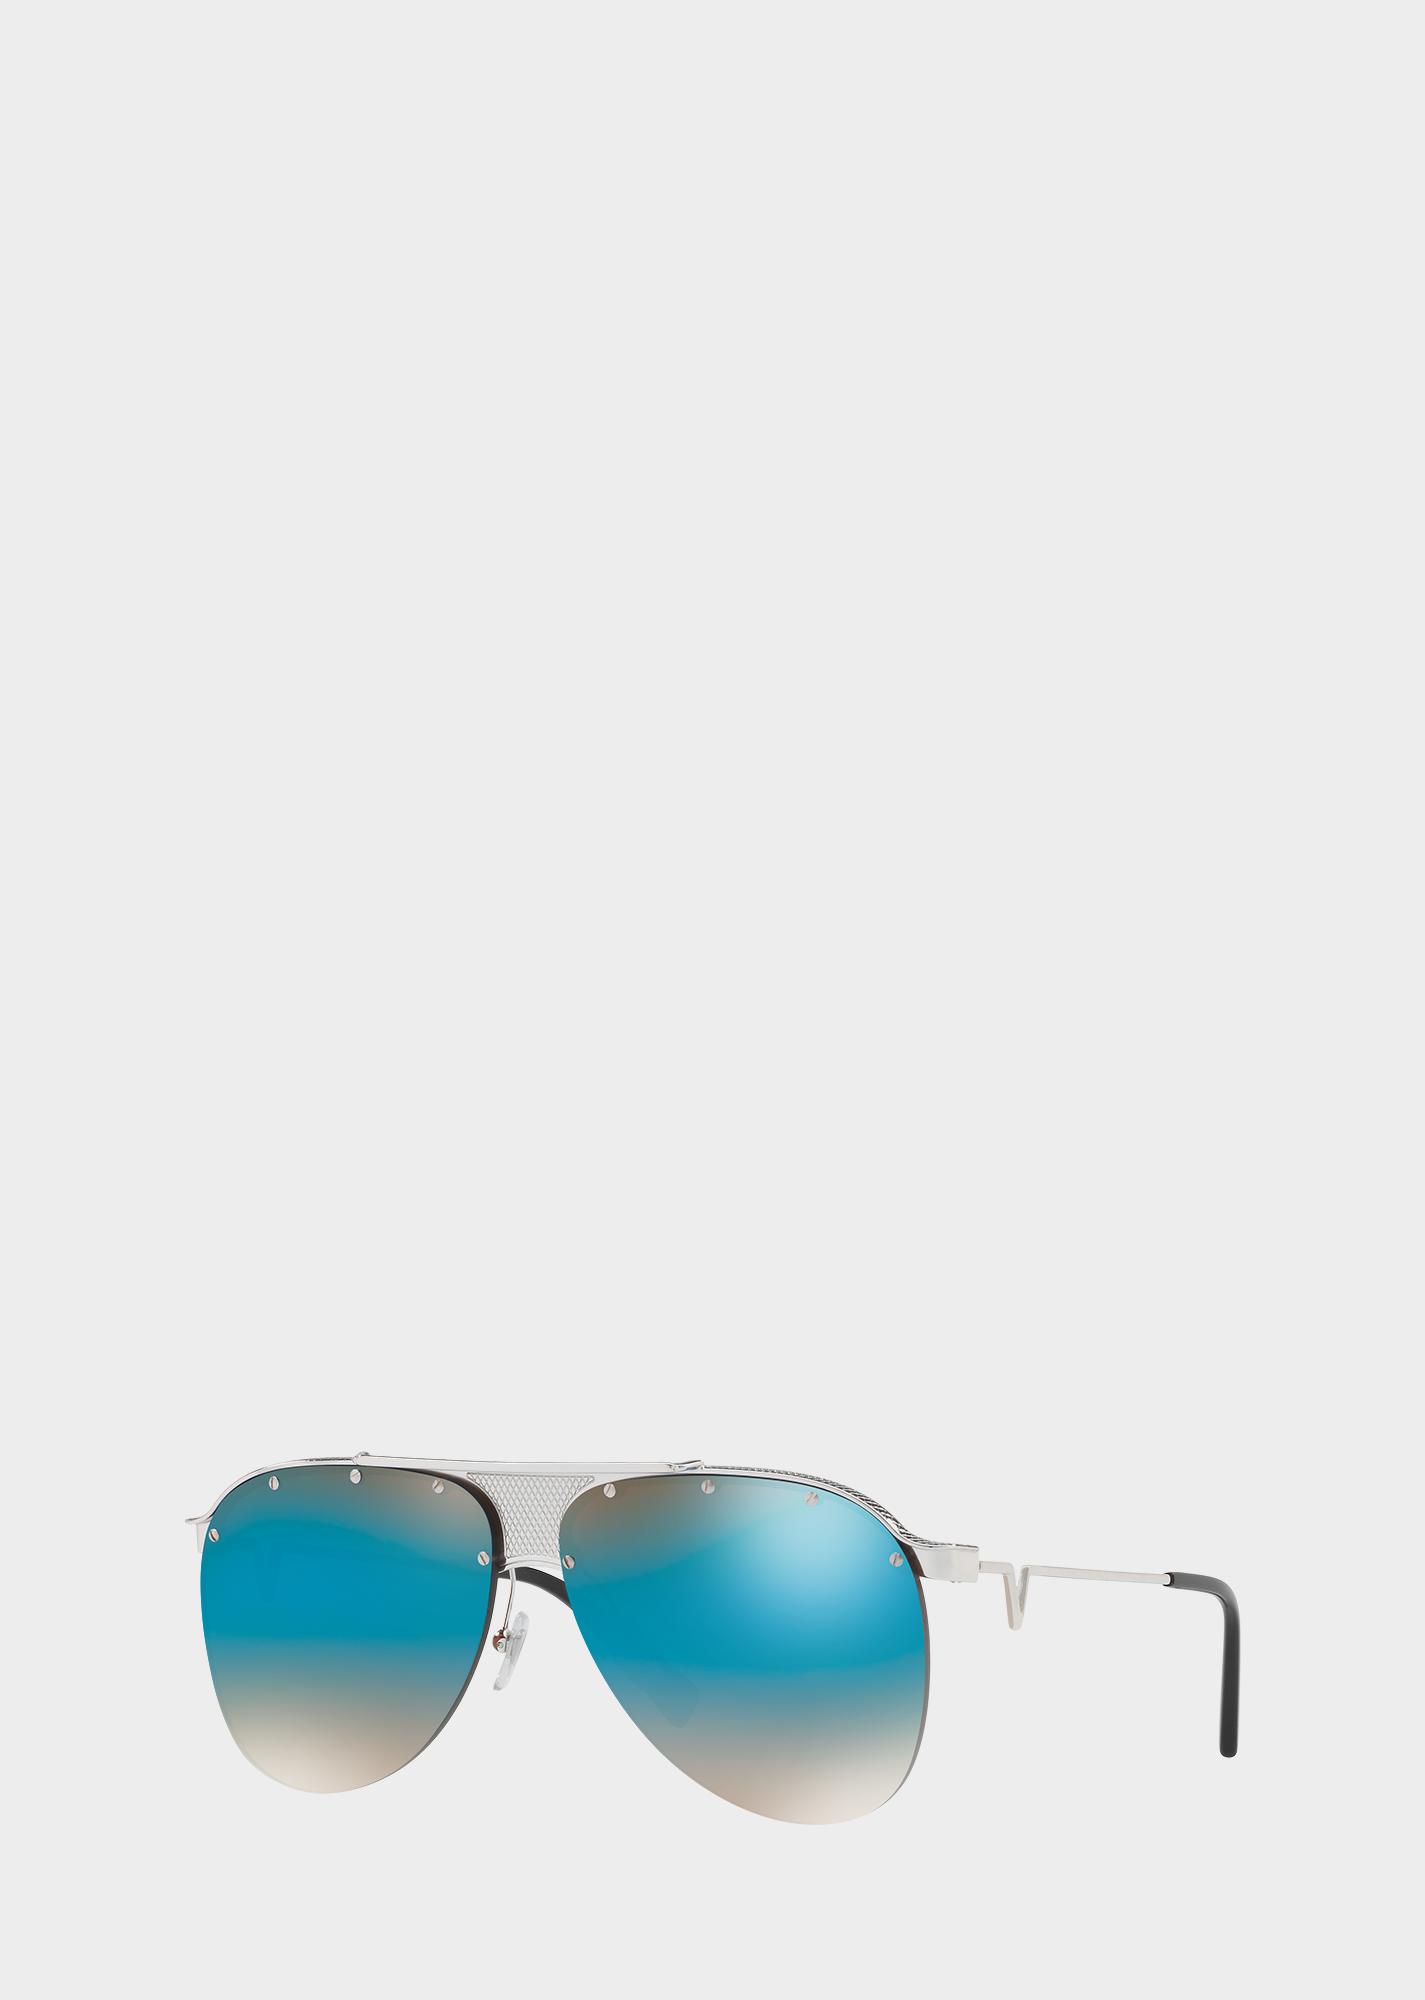 d96f9498e87 Blue V-Pilot Sunglasses - Blue Eyewear - Sale! Up to 75% OFF! Shop at  Stylizio for women s and men s designer handbags